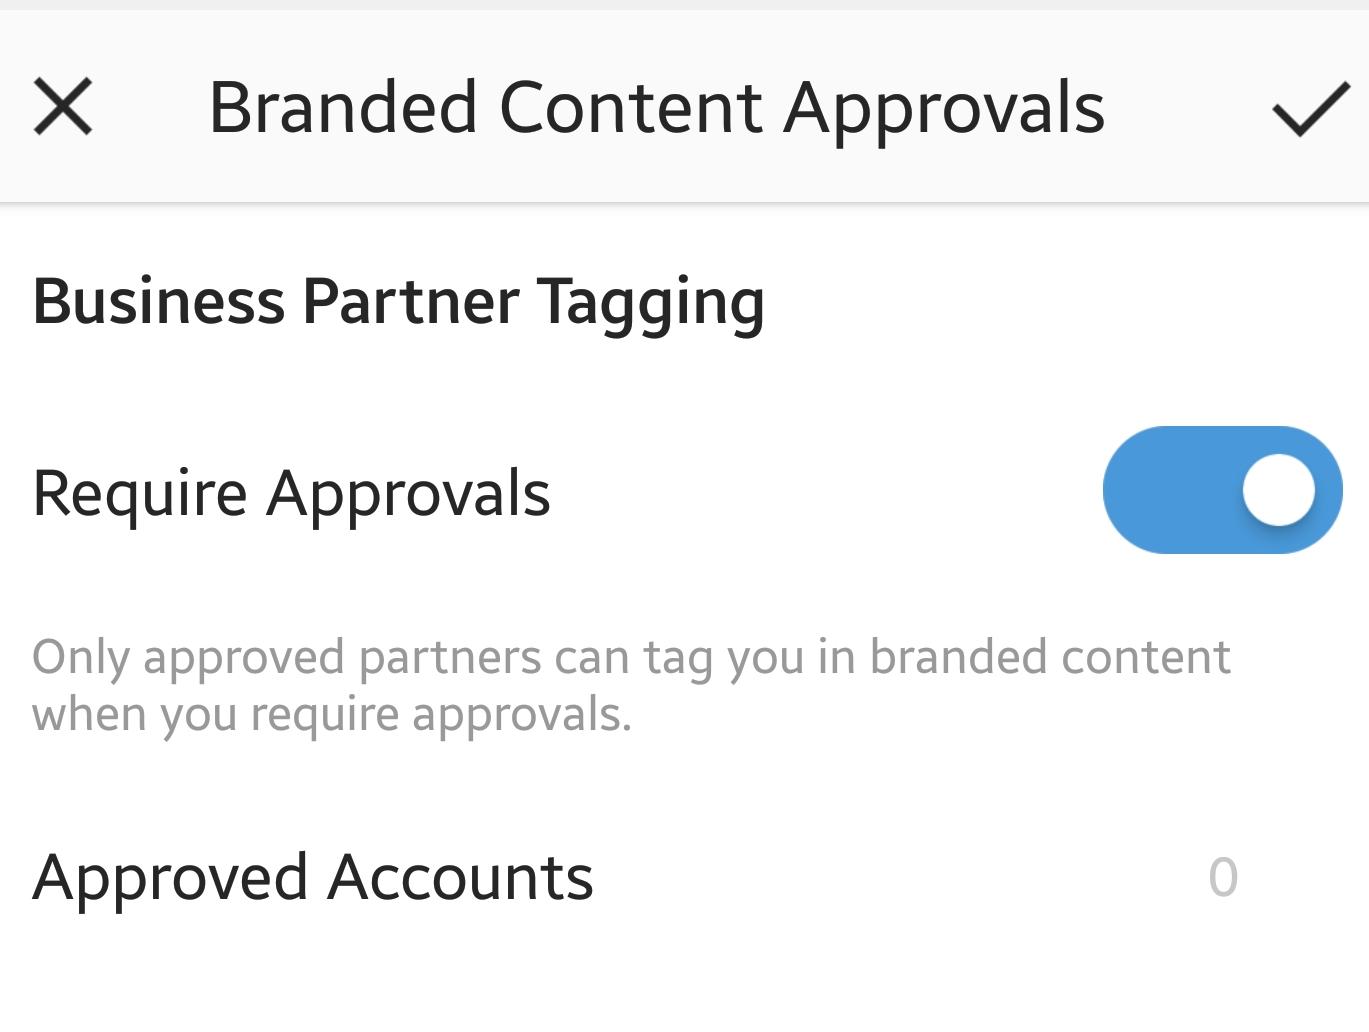 Активиране на Branded Content одобрението